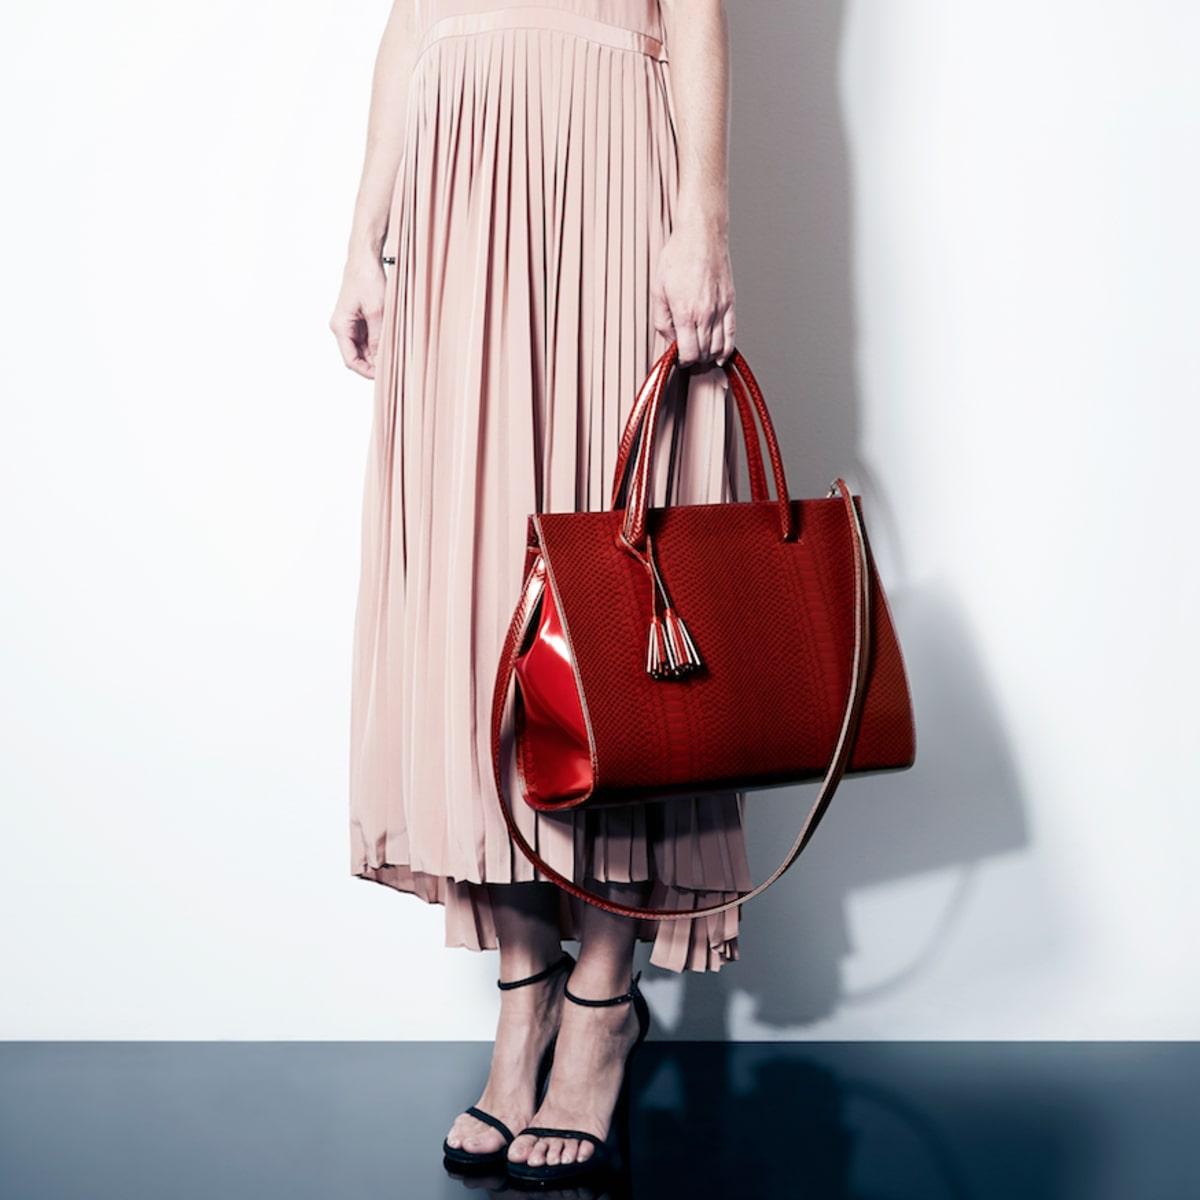 The V'irkin bag, alternative to Birkin bag